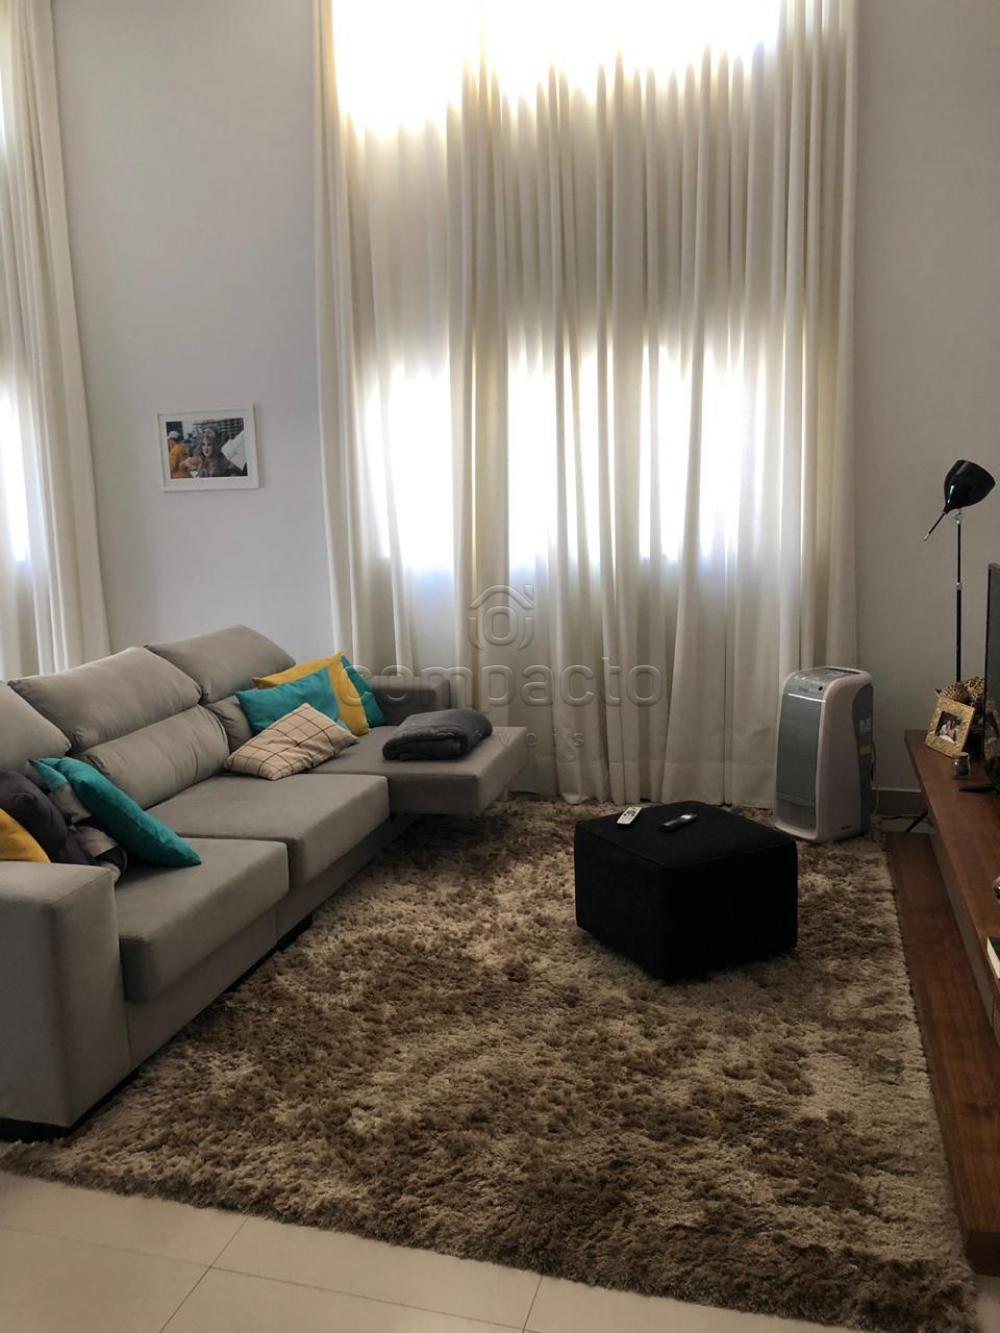 Comprar Casa / Condomínio em Bauru apenas R$ 850.000,00 - Foto 2